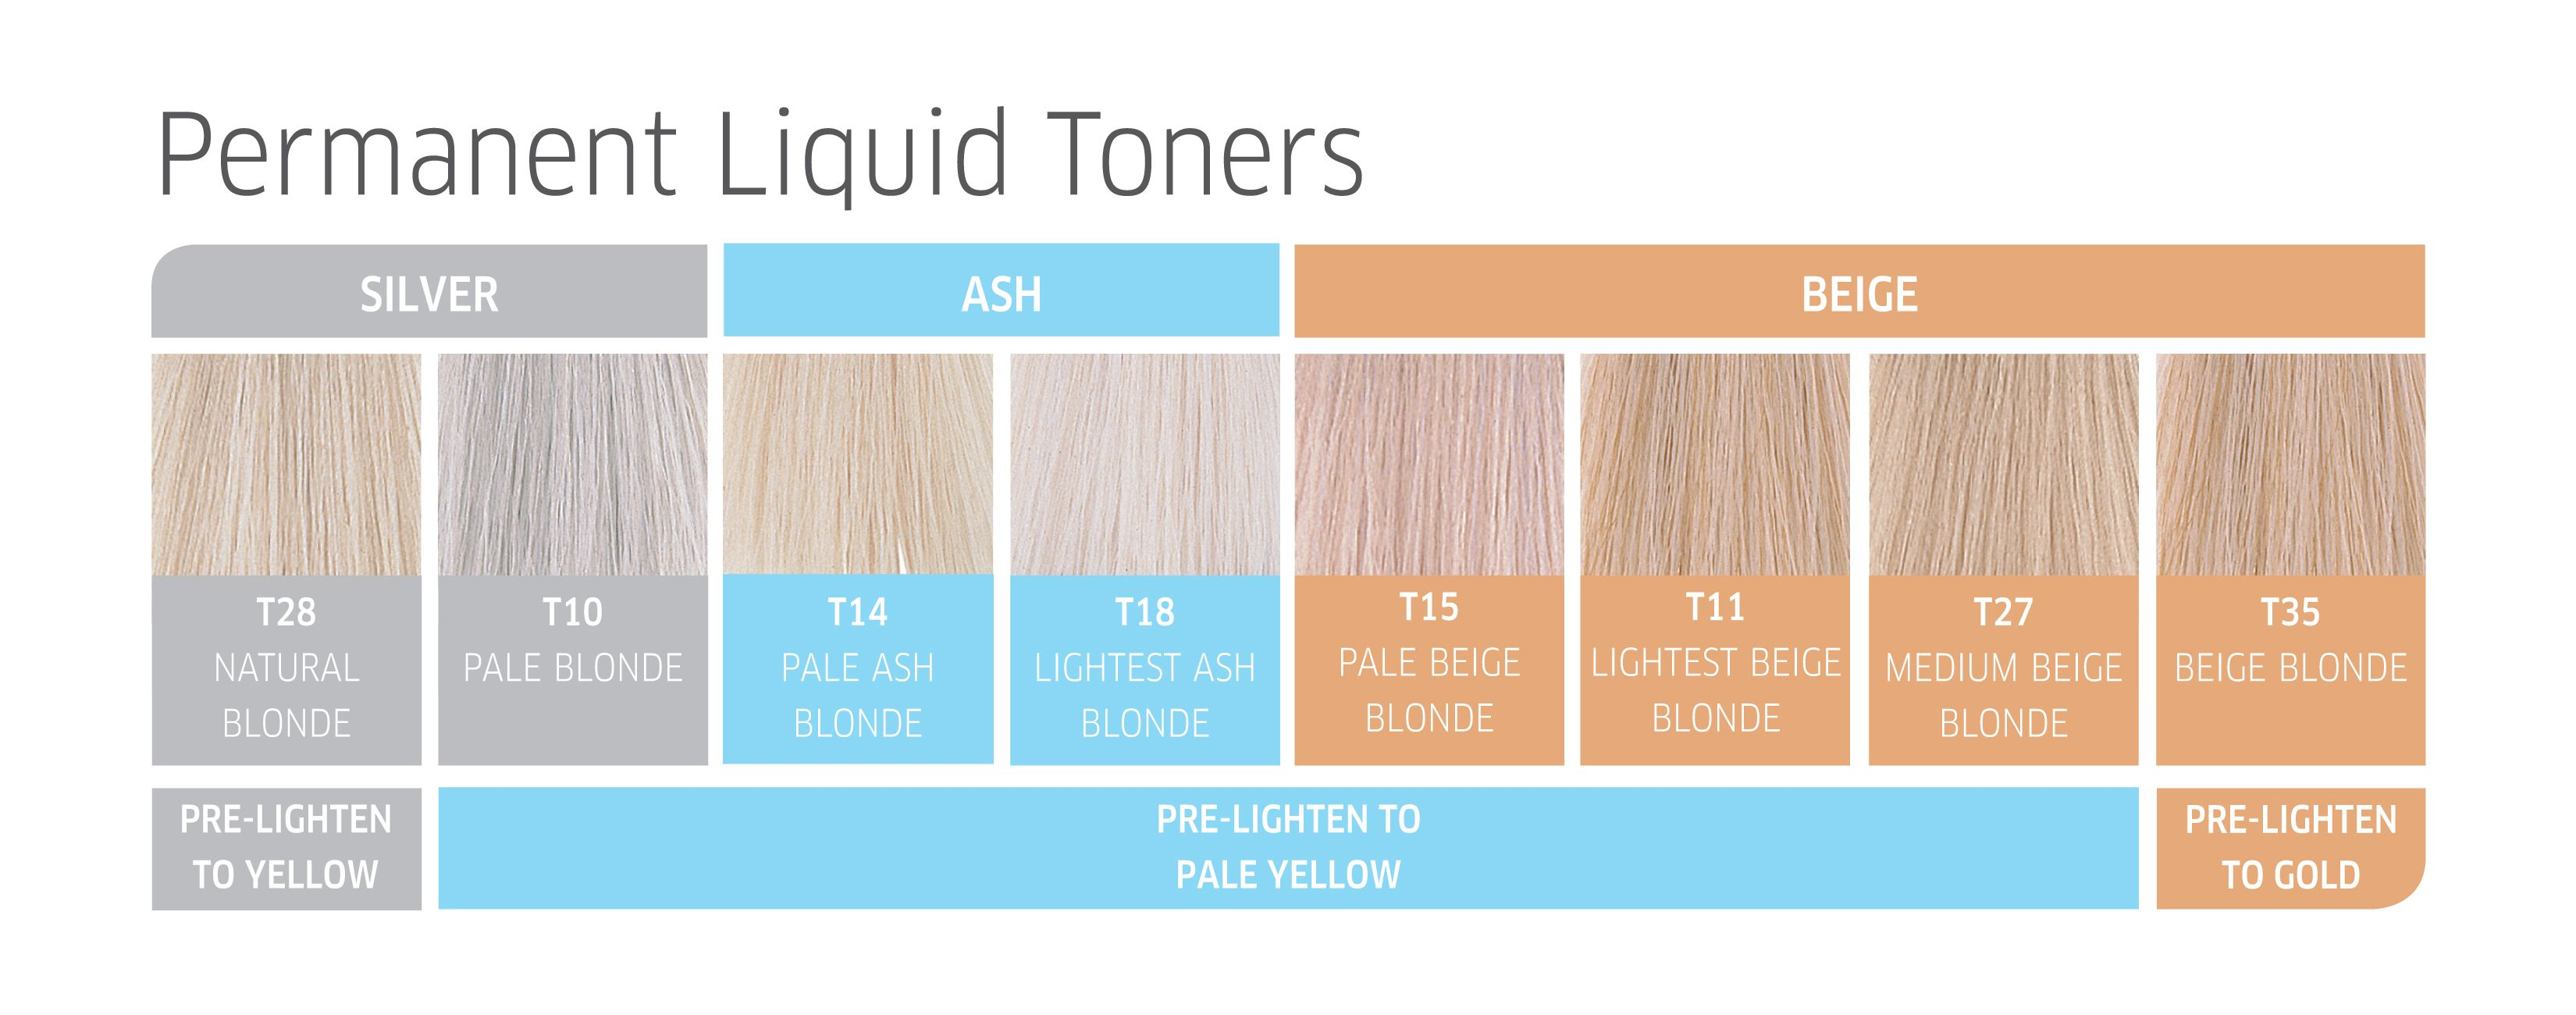 Wella permanent liquid toners lush locks pinterest hair what toner should you use for orange hair wella color charm toner chart nvjuhfo Image collections